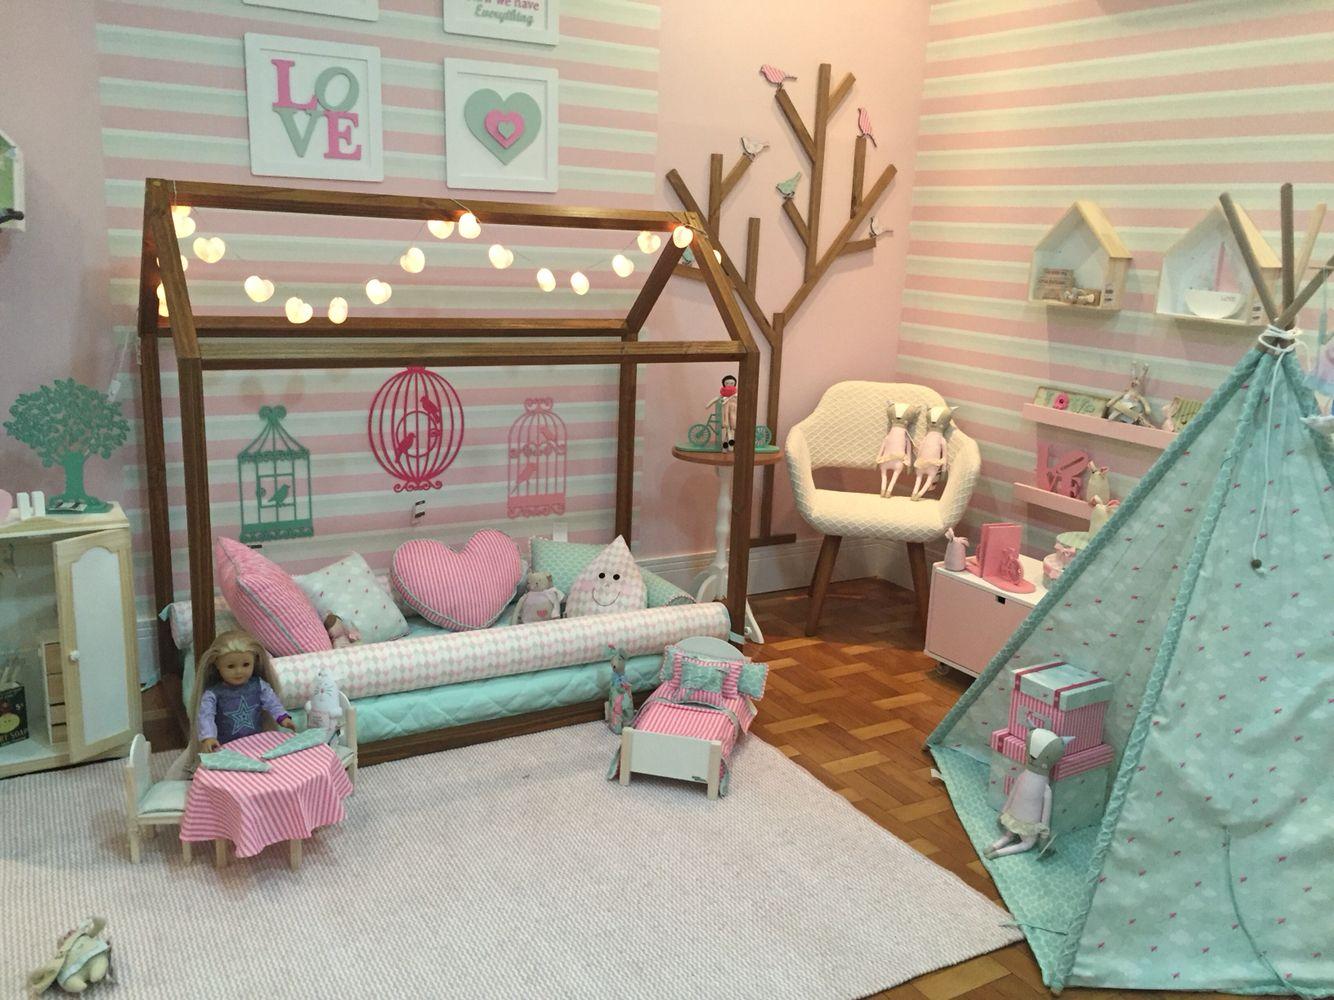 Quarto lindo kid 39 s concept curitiba decor decoraci n for Decoracion habitacion infantil montessori